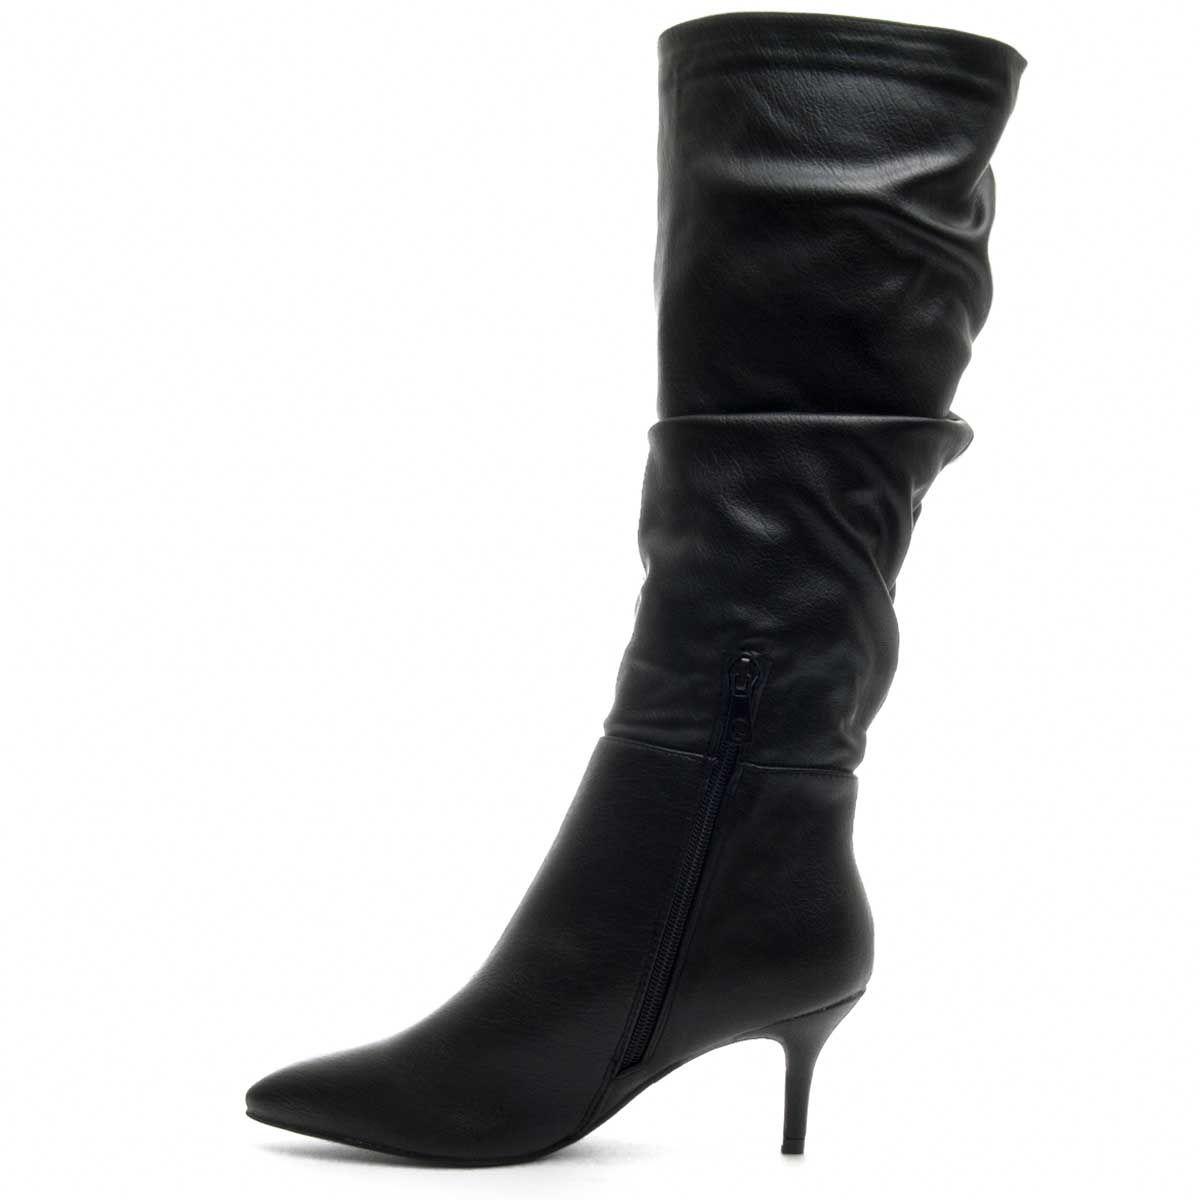 Montevita Quality Boot in Black